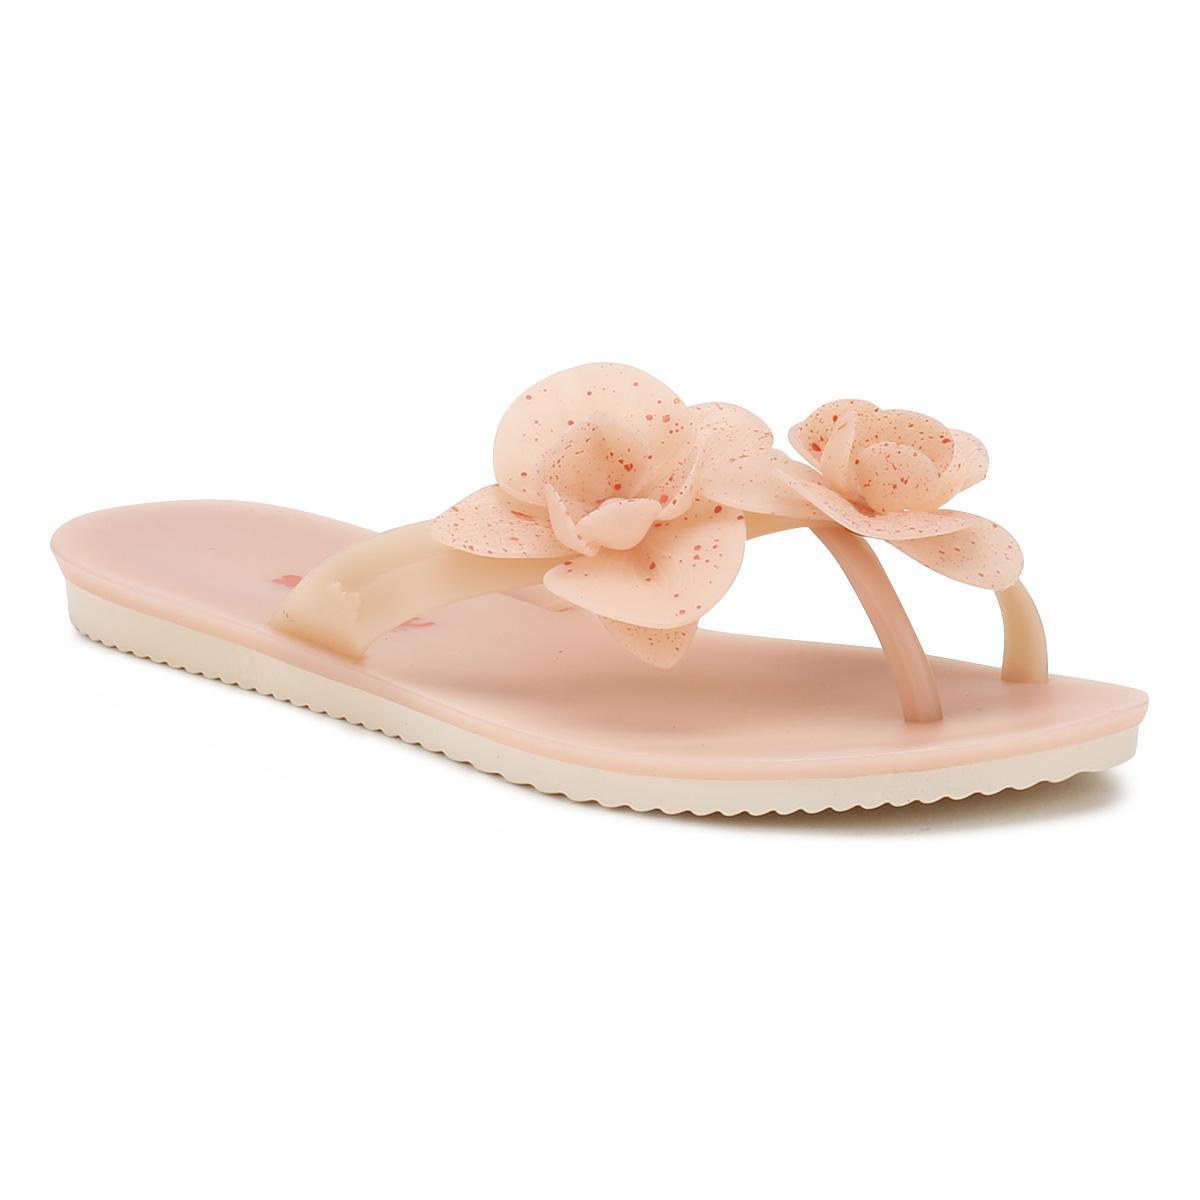 6c8dc4358d297 Lyst - Zaxy Womens Blush Pink Ice Flower Flip Flops Women s Flip ...